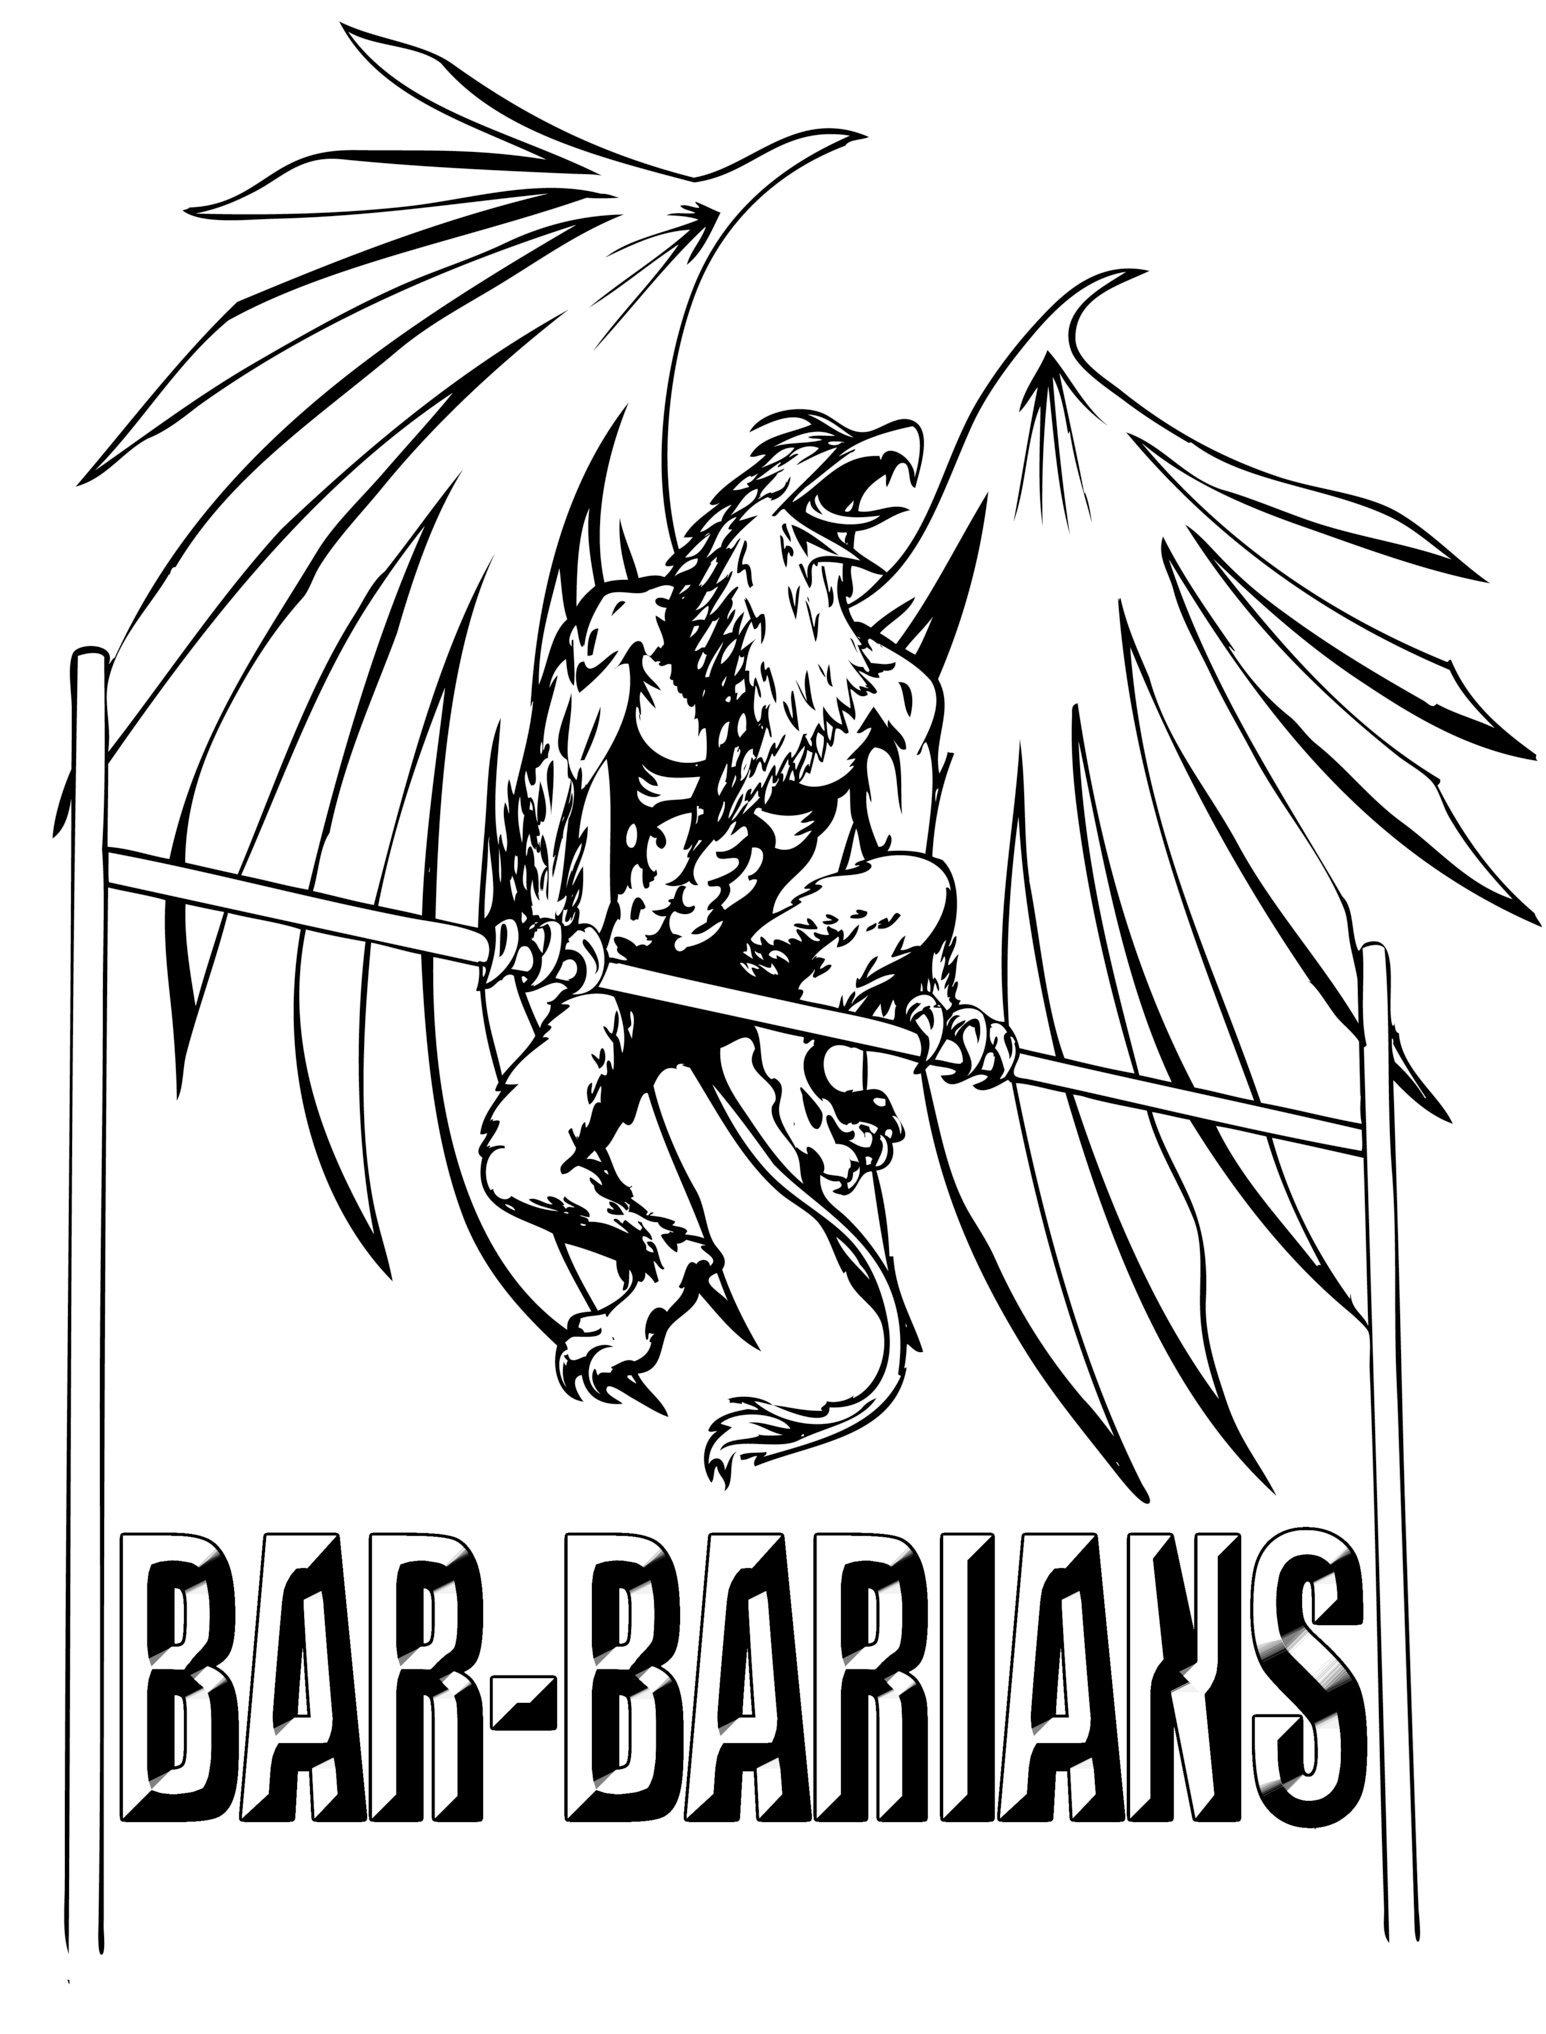 barbarians redux text effect.jpg